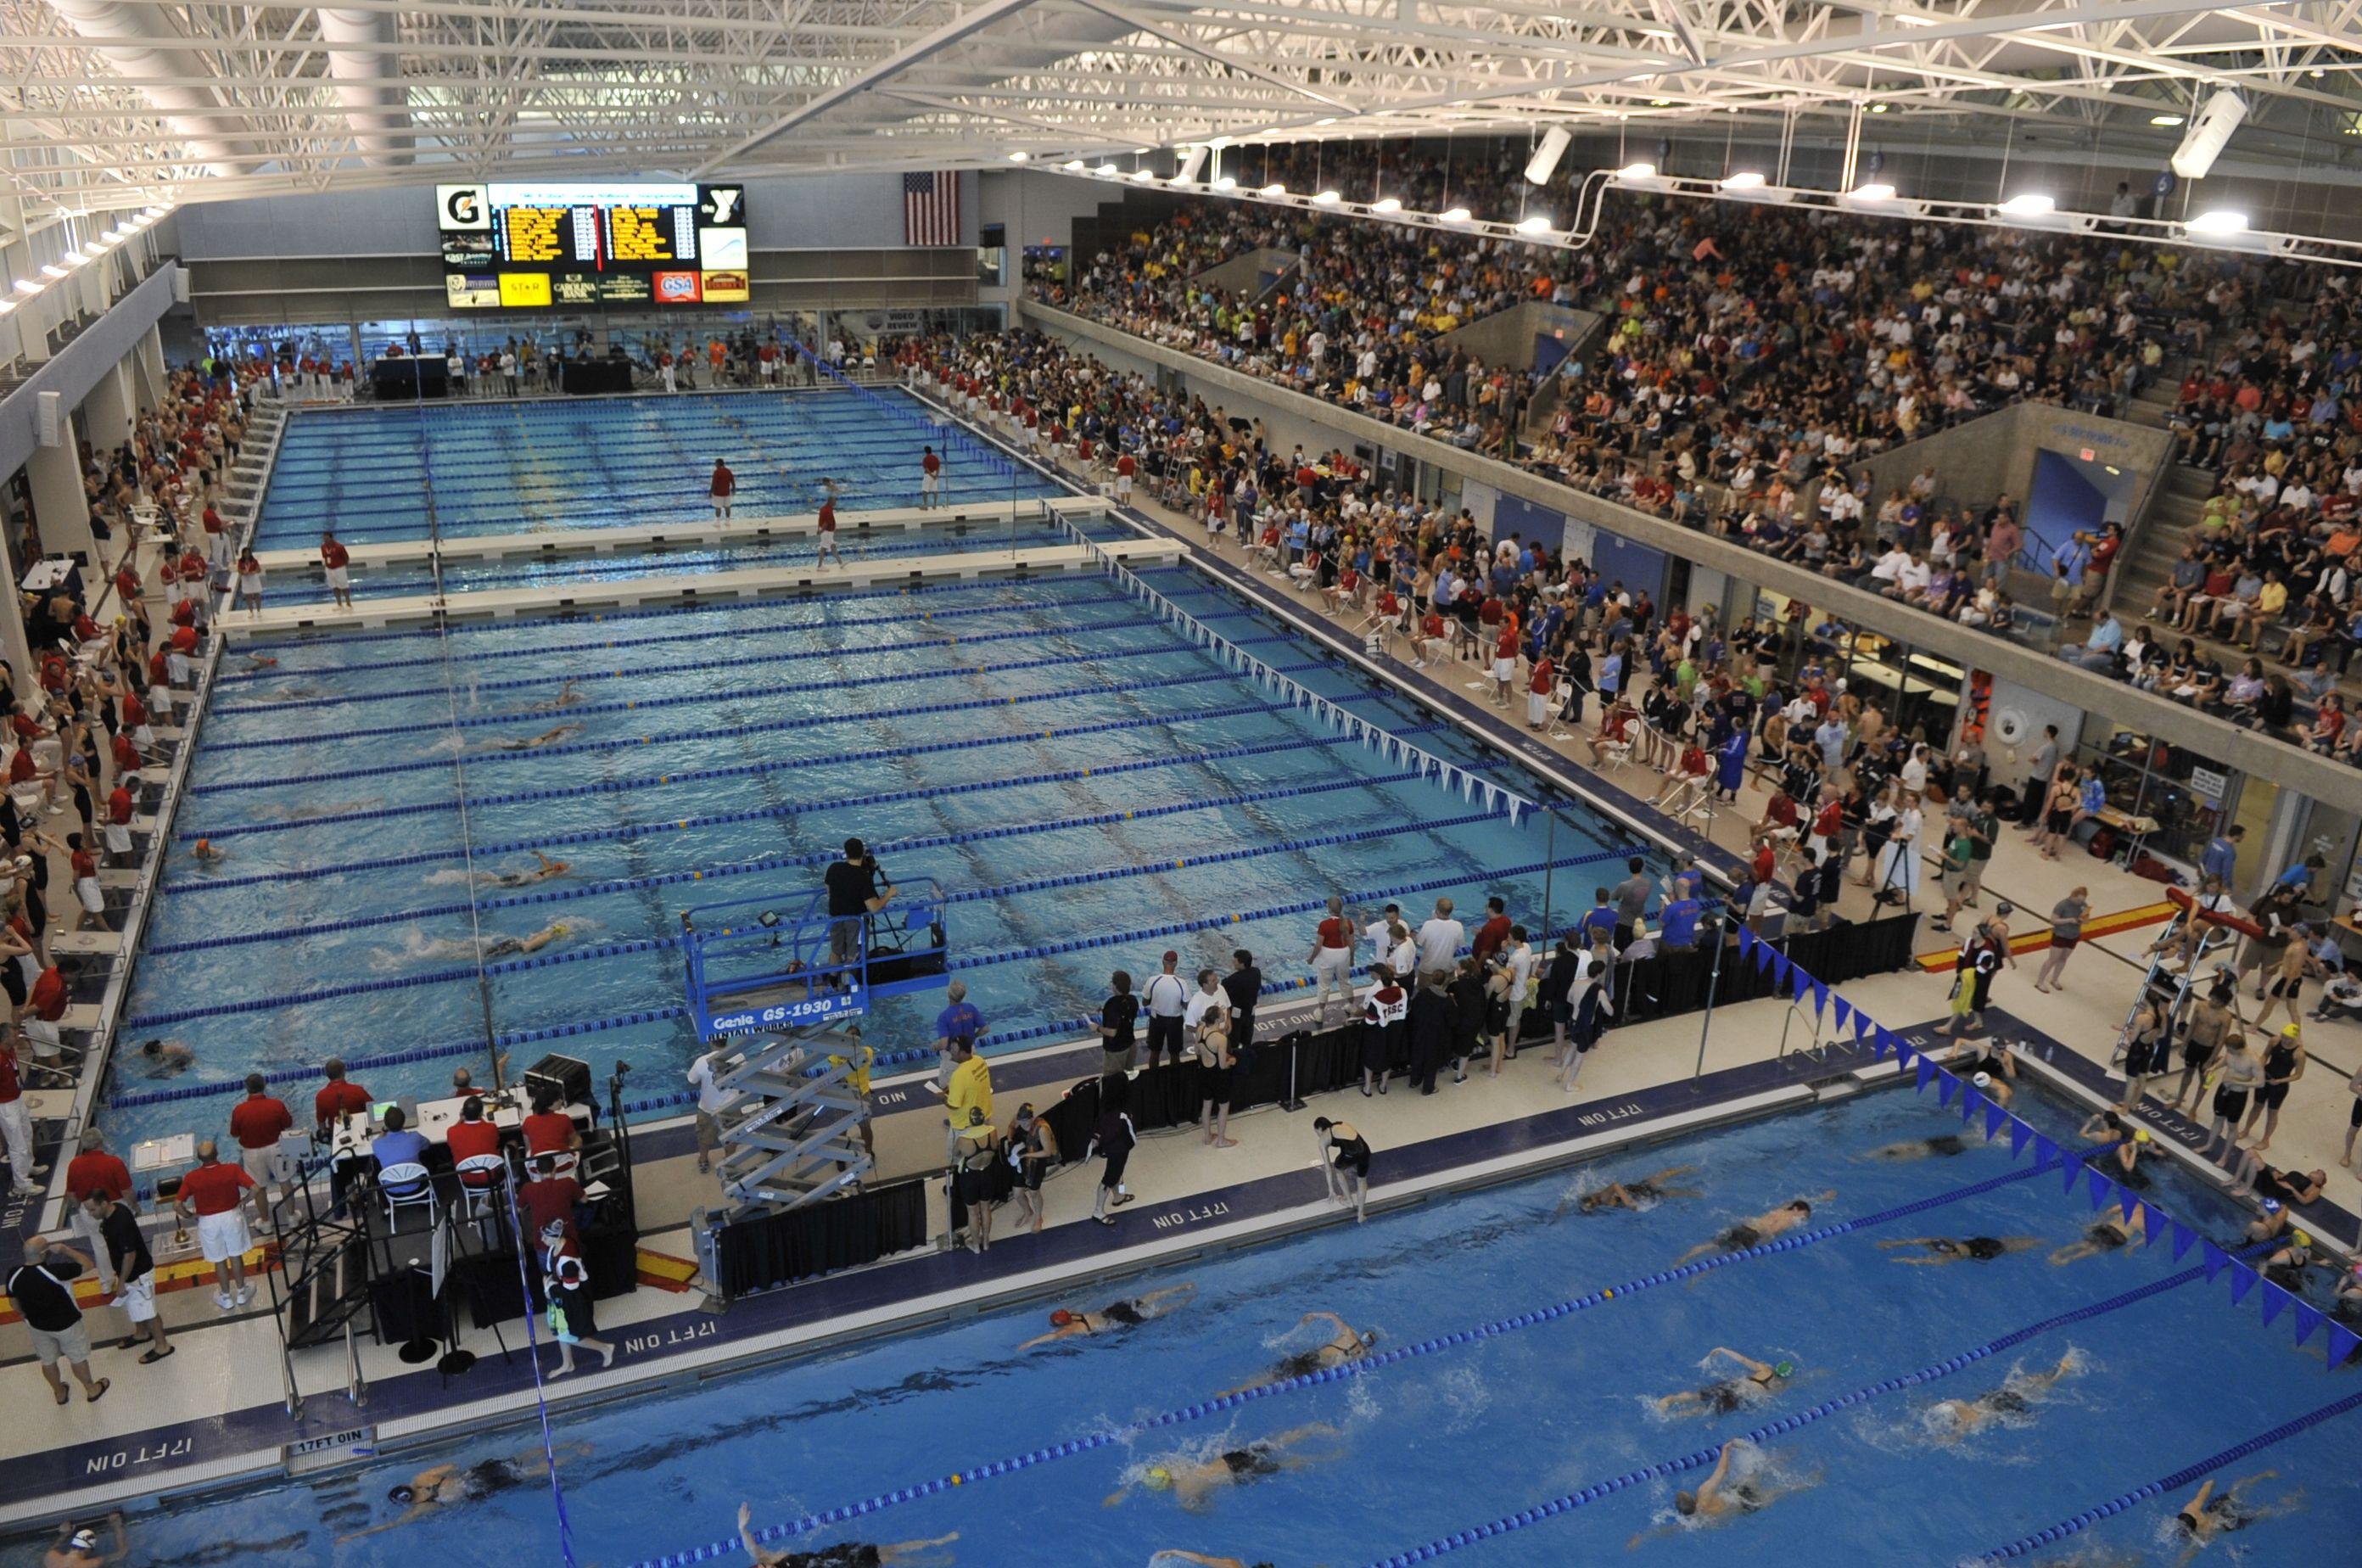 Ymca Swimming Event At The Greensboro Aquatic Center Swim Meet Sport Event Ymca